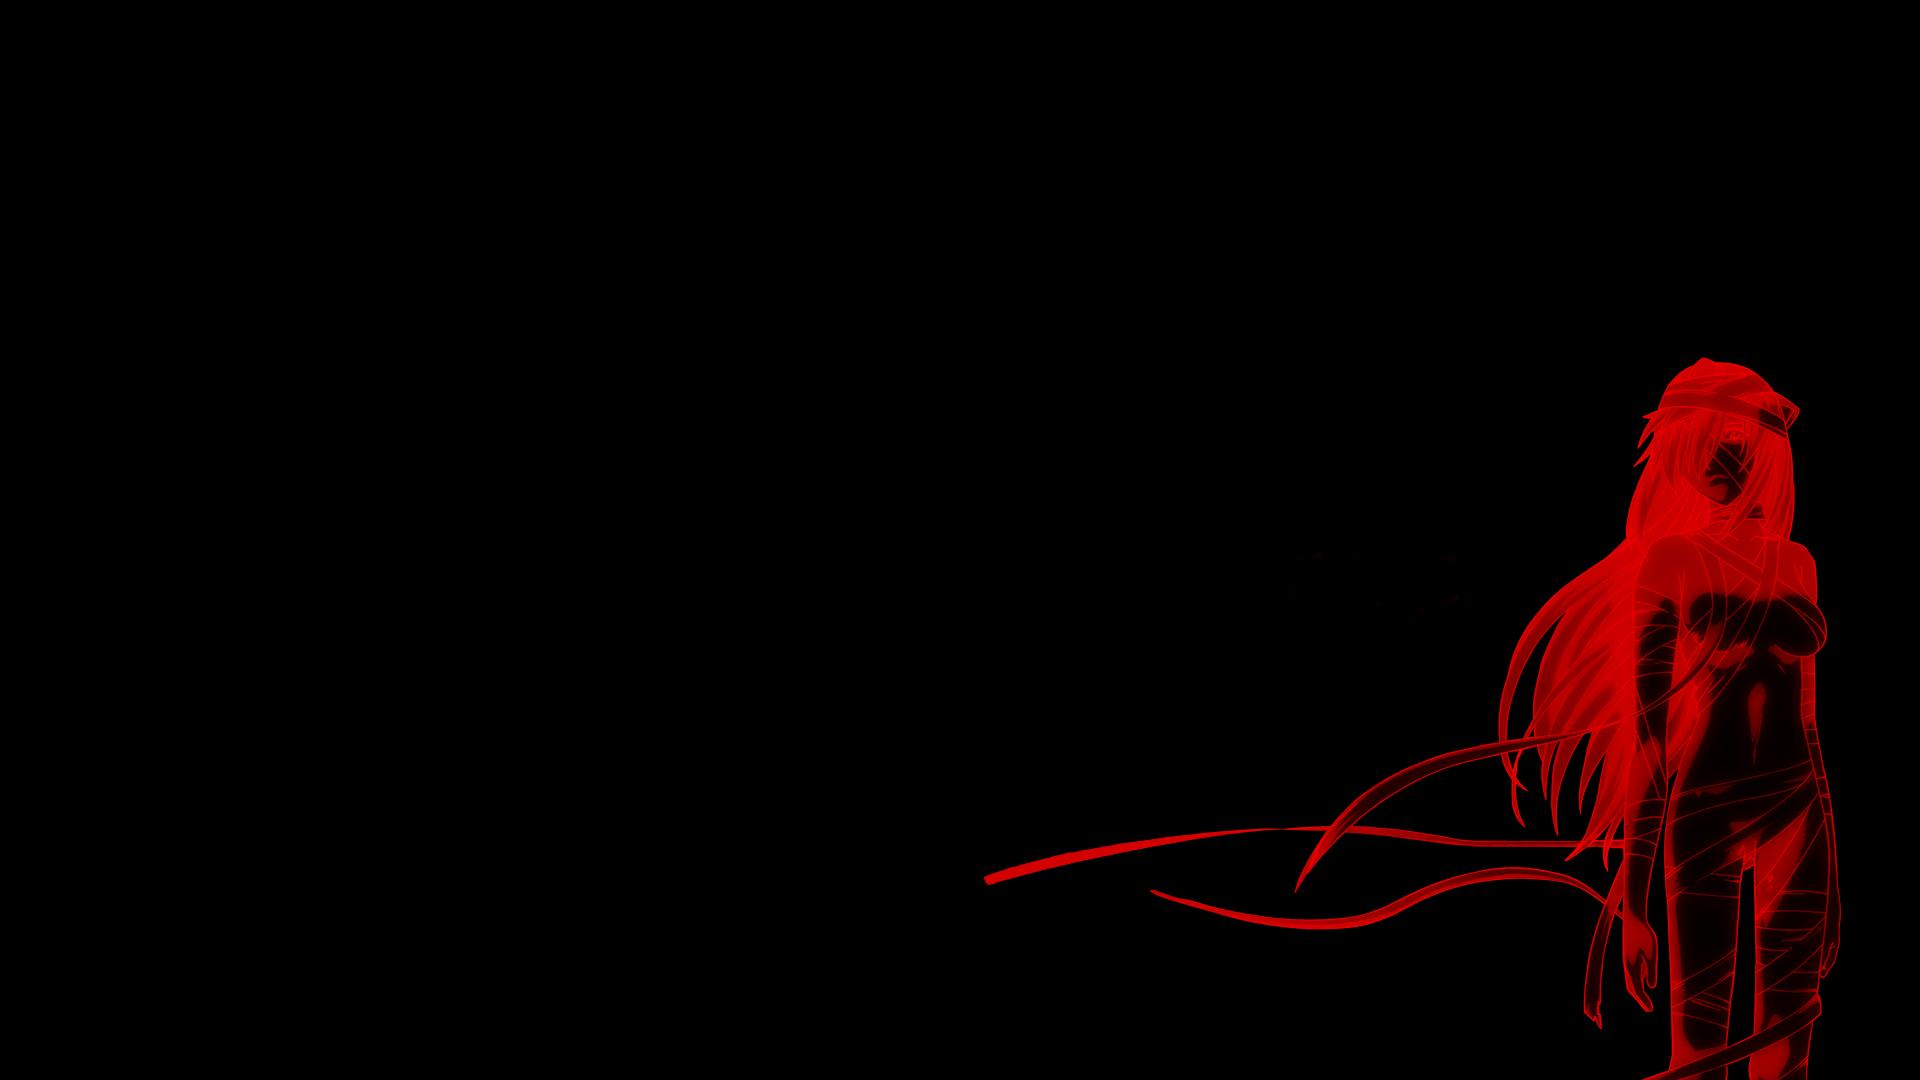 Anime Girls Minimalism Red Elfen Lied Nyu Darkness Screenshot Computer Wallpaper Font